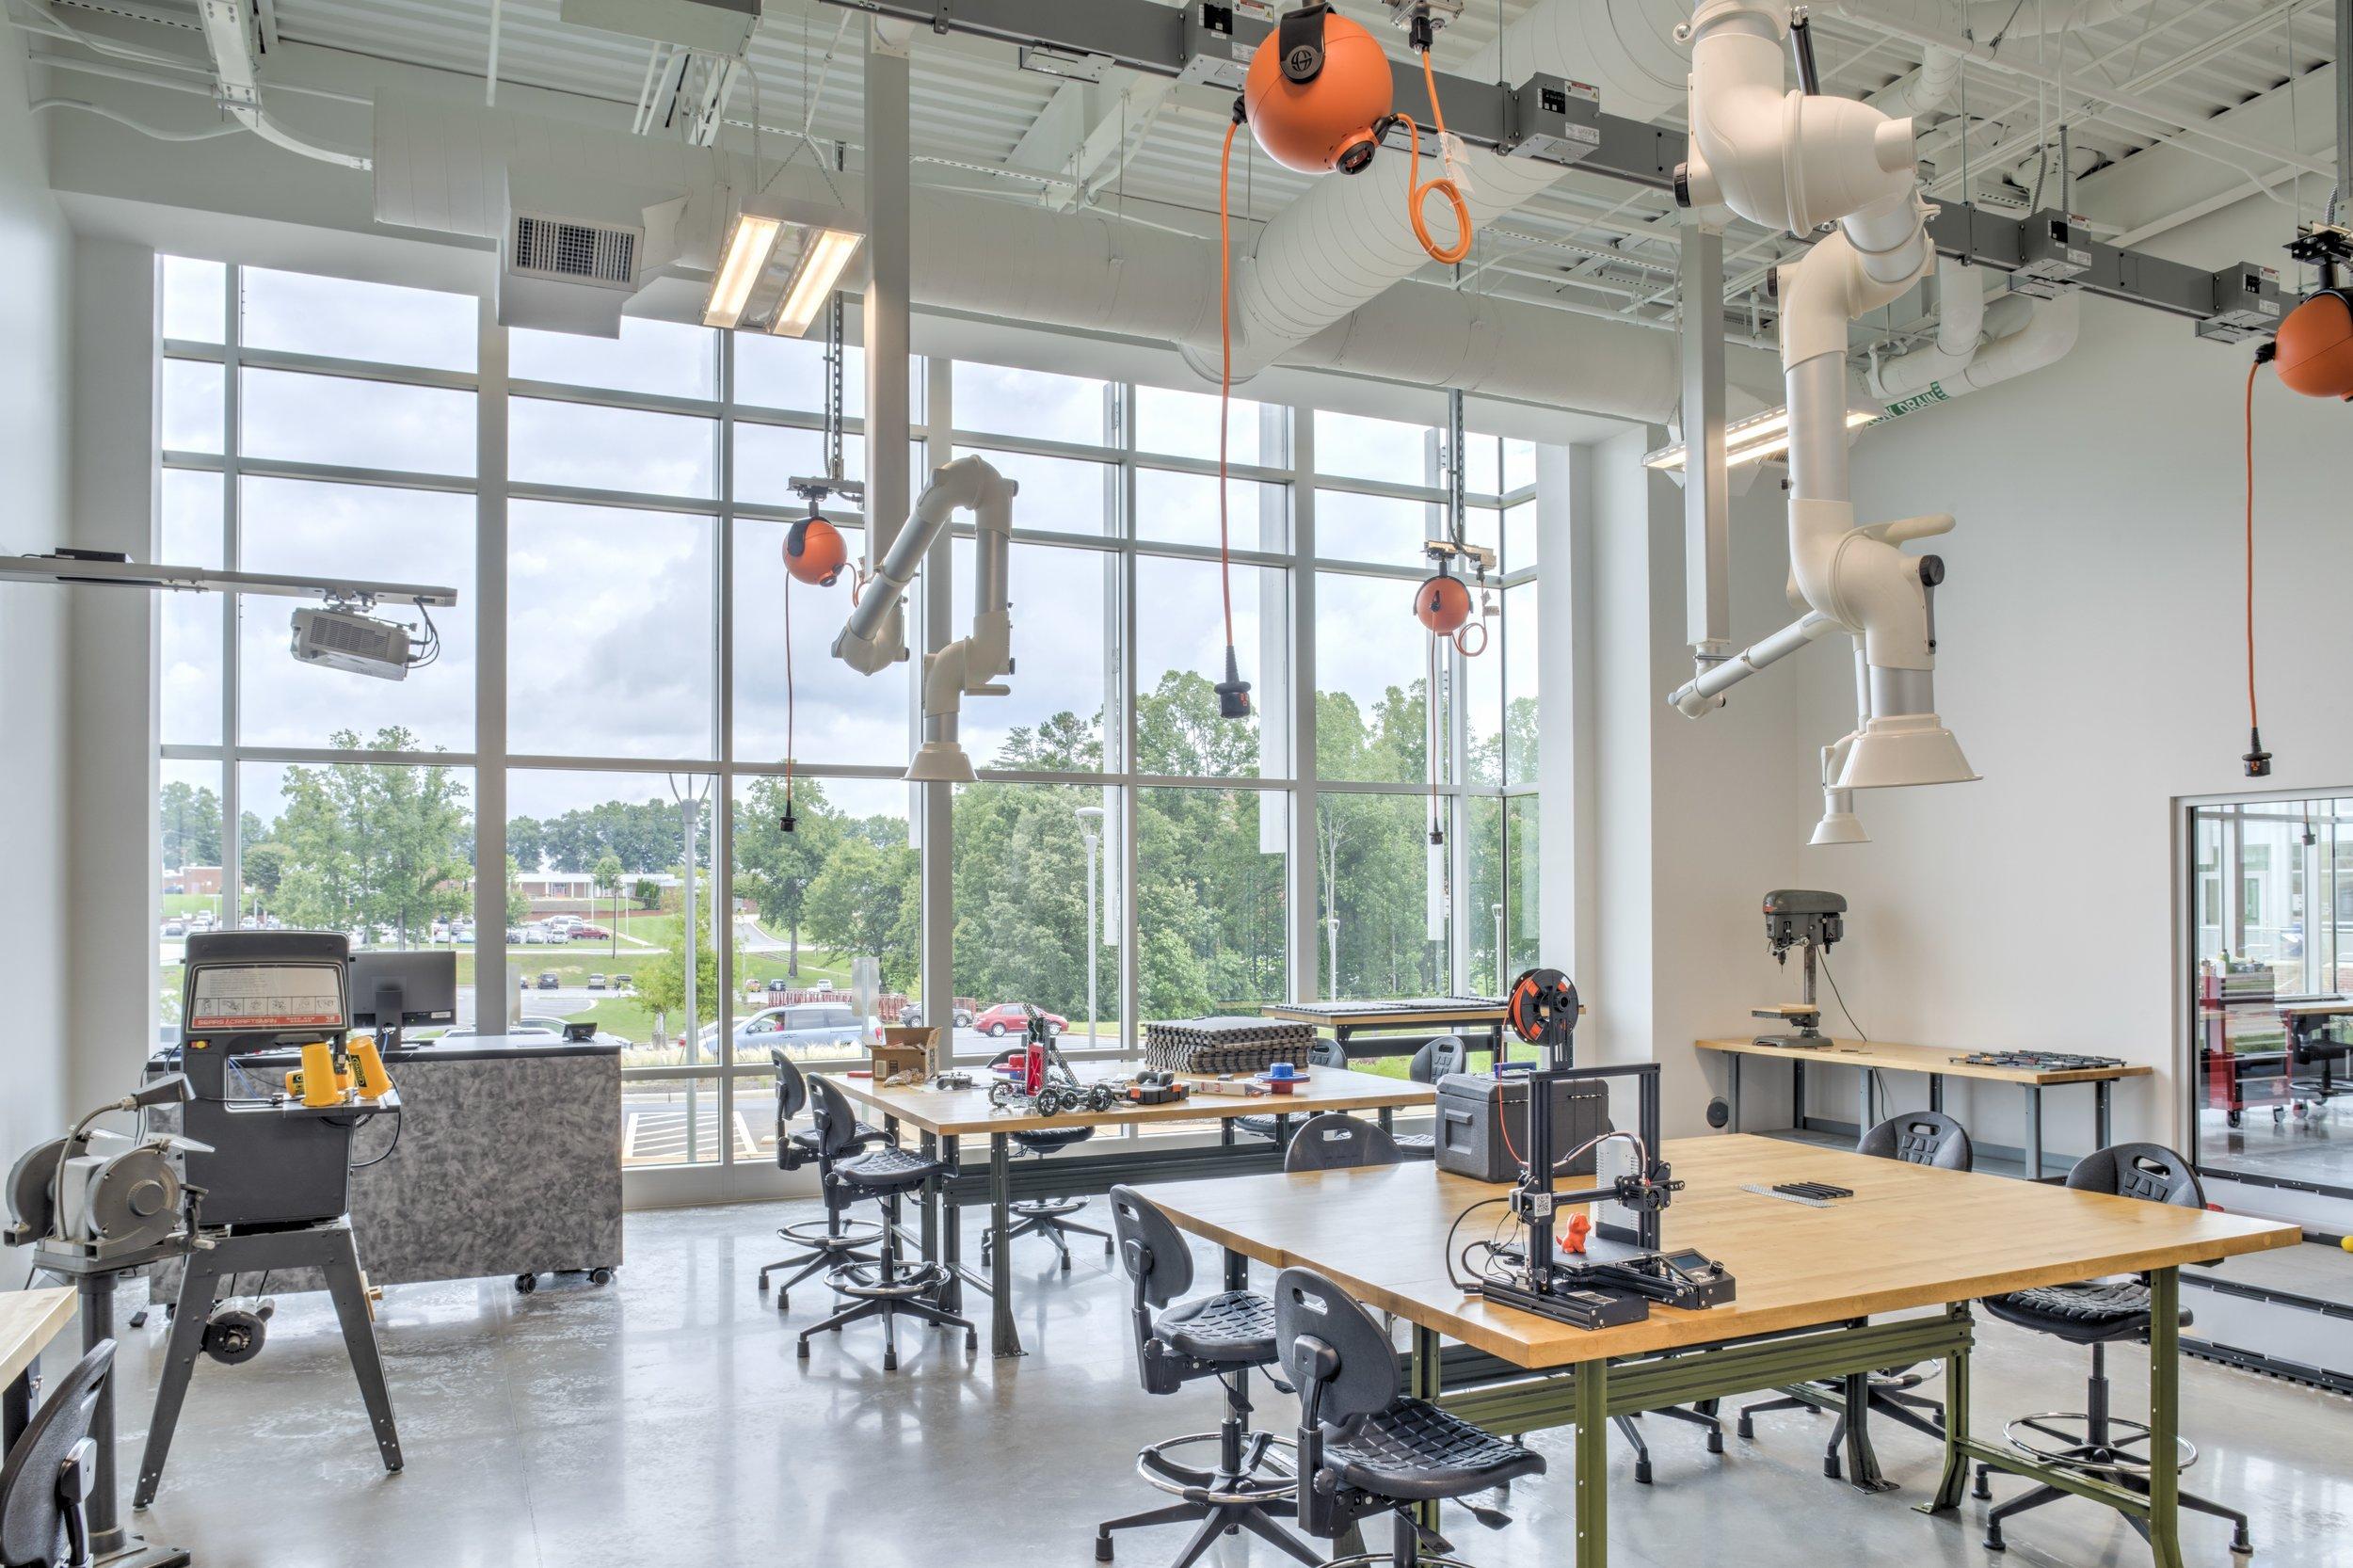 ADW-Higher-Education-CVCC-Hickory-NC-Workforce-Solutions-Interior-Workshop5.jpg